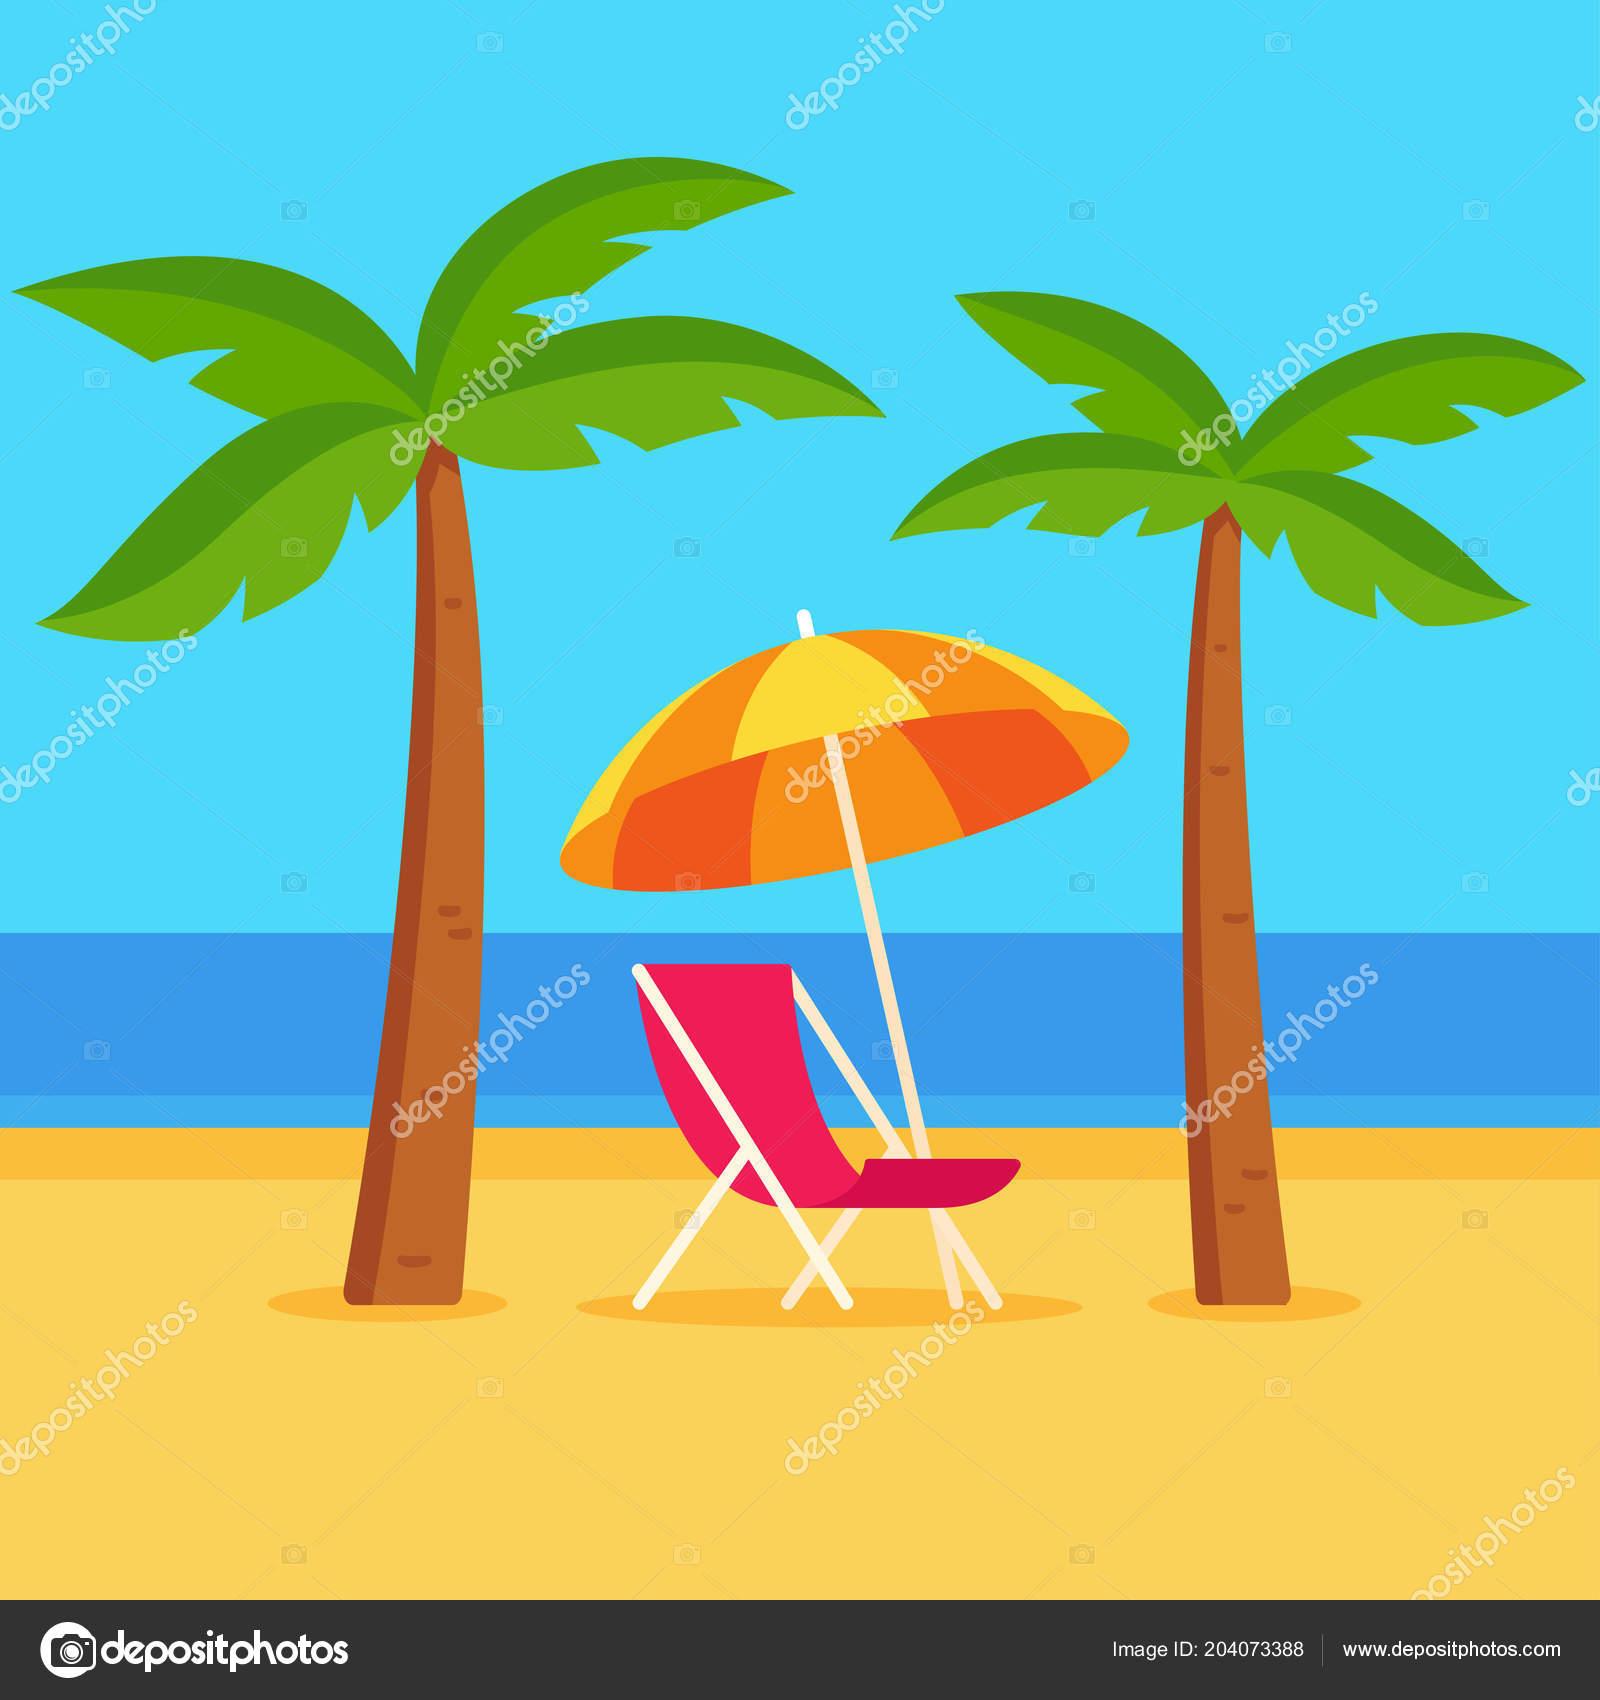 Simple Beach Chair Drawing Tropicl Summer Vacation Vector Illustration Beach Scene Umbrella Beach Chair Stock Vector C Sudowoodo 204073388